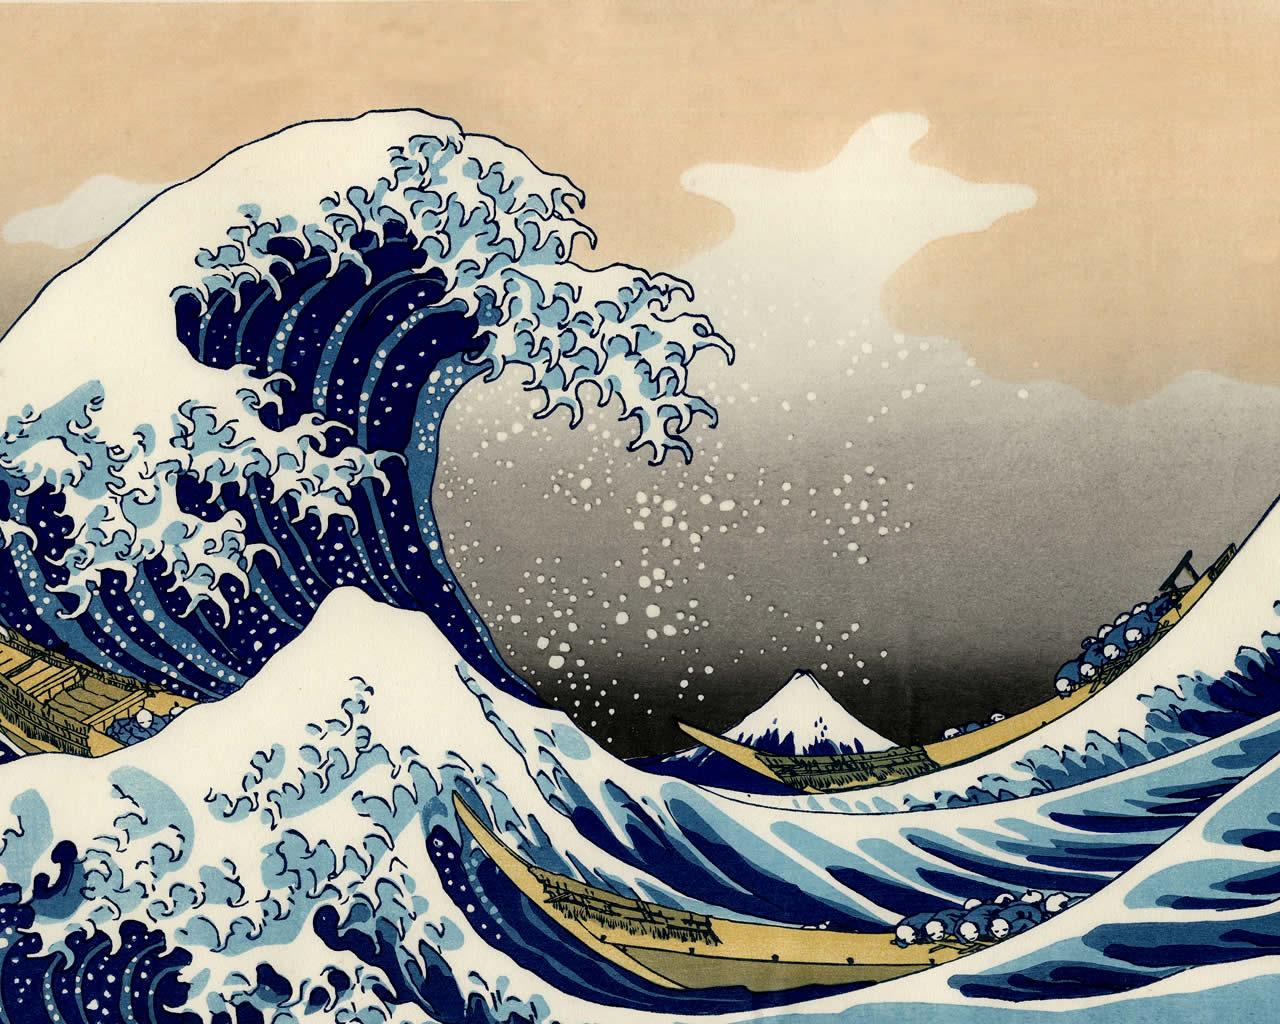 L'onda - Katsushika Hokusai